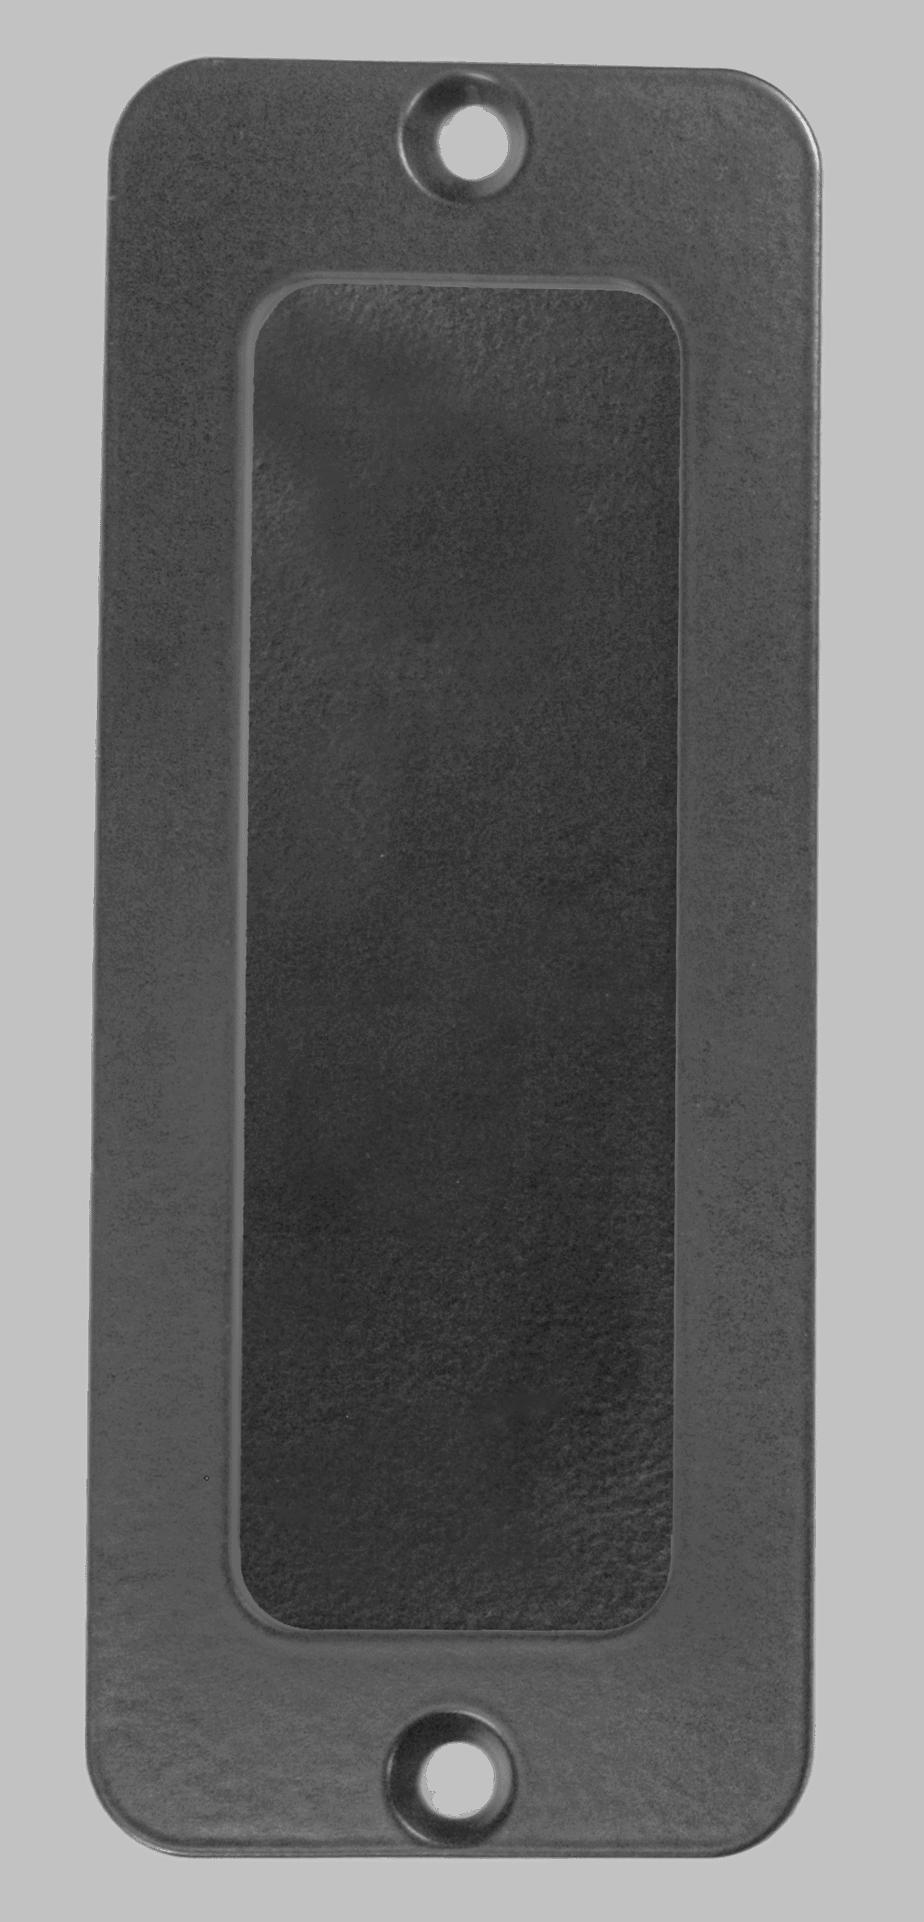 Goldberg Brothers flush pull handle with rounded rectangular shape